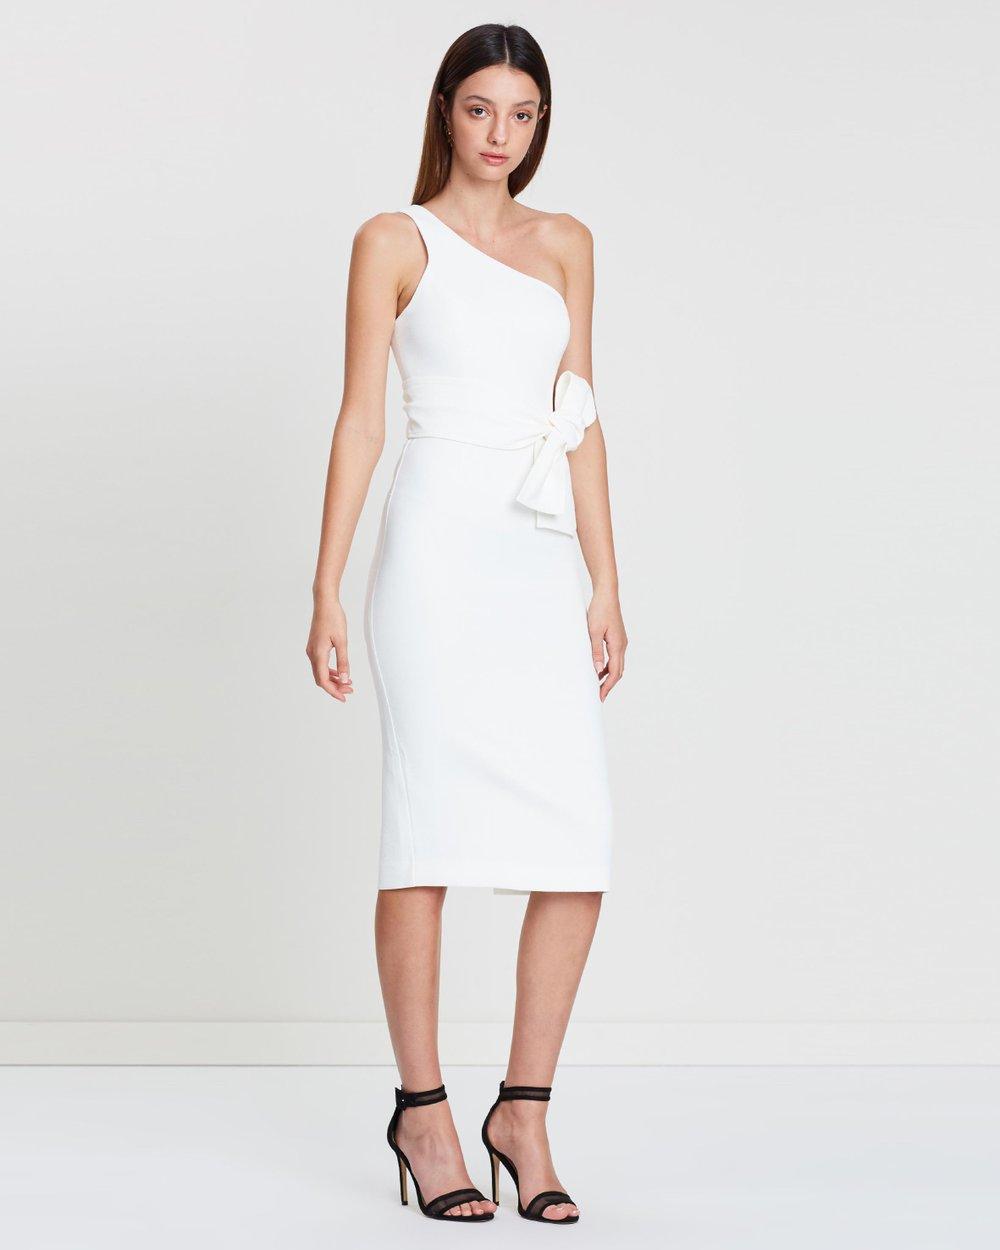 ff037976769 One Shoulder Midi Dress with Belt by Shona Joy Online